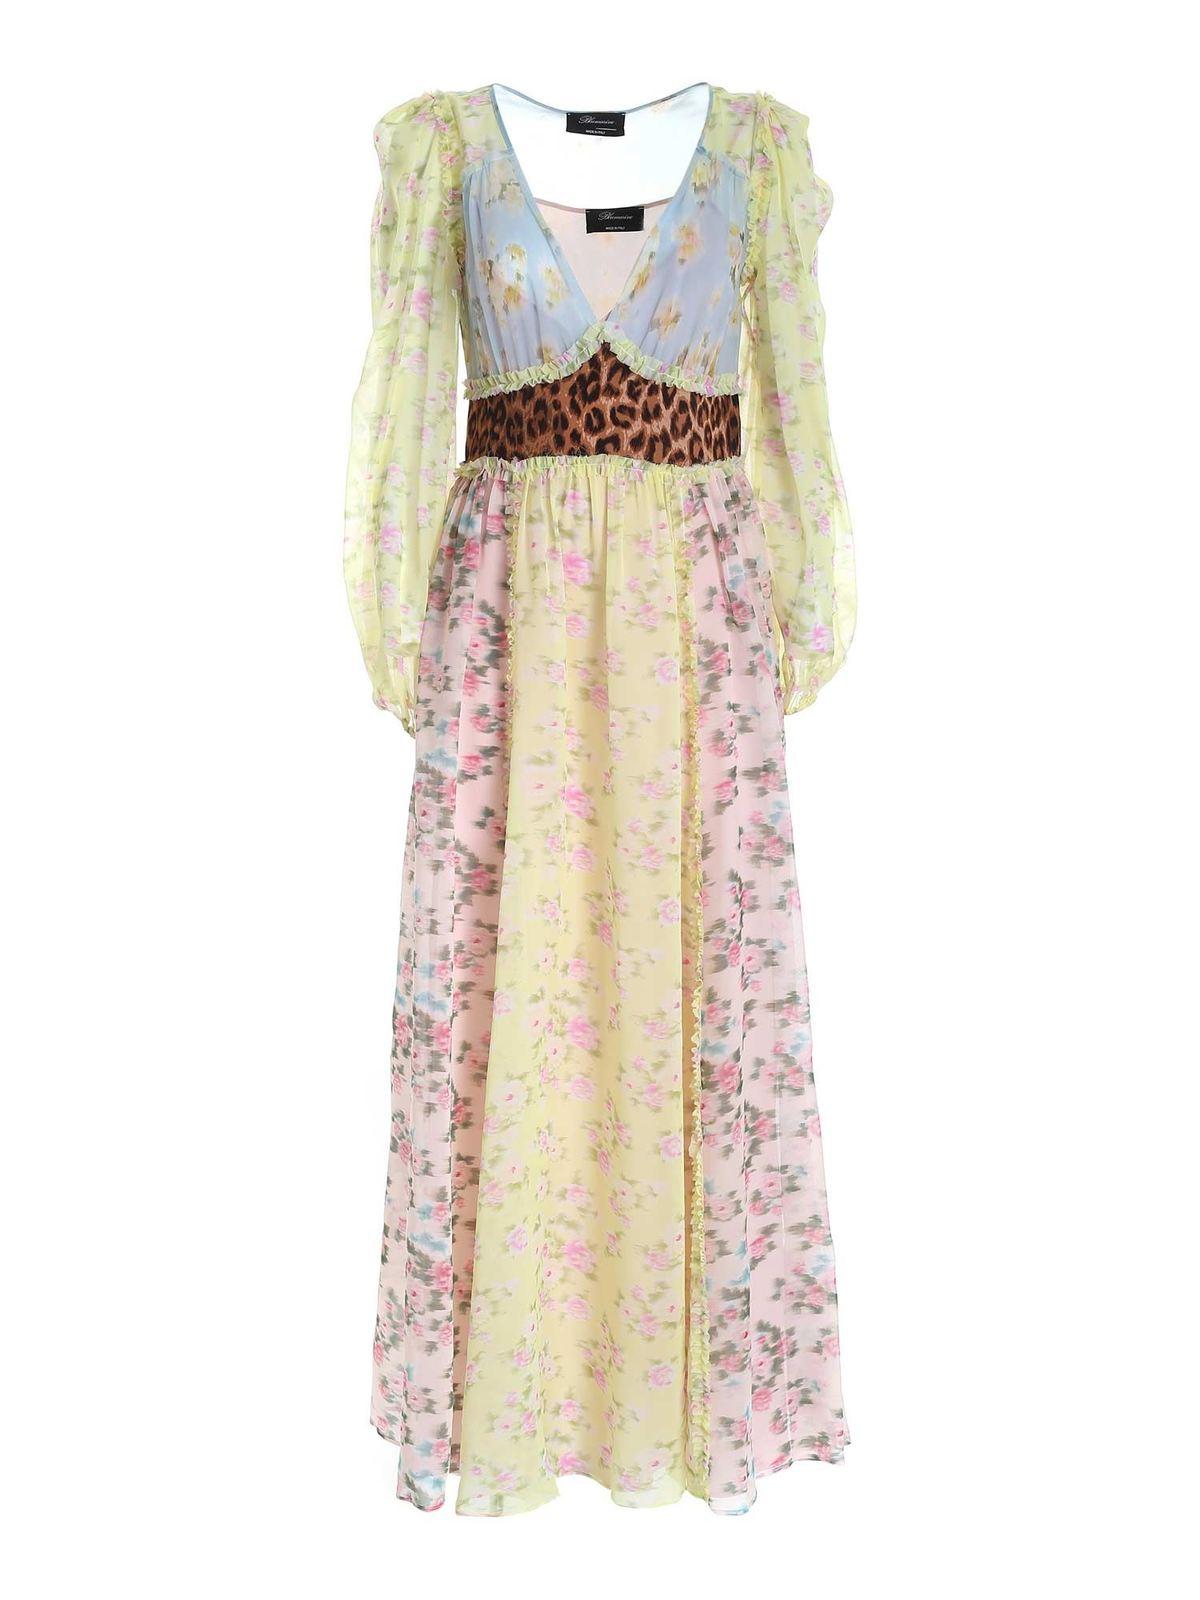 Blumarine Silks FLORAL PATTERN MULTICOLOR LONG DRESS